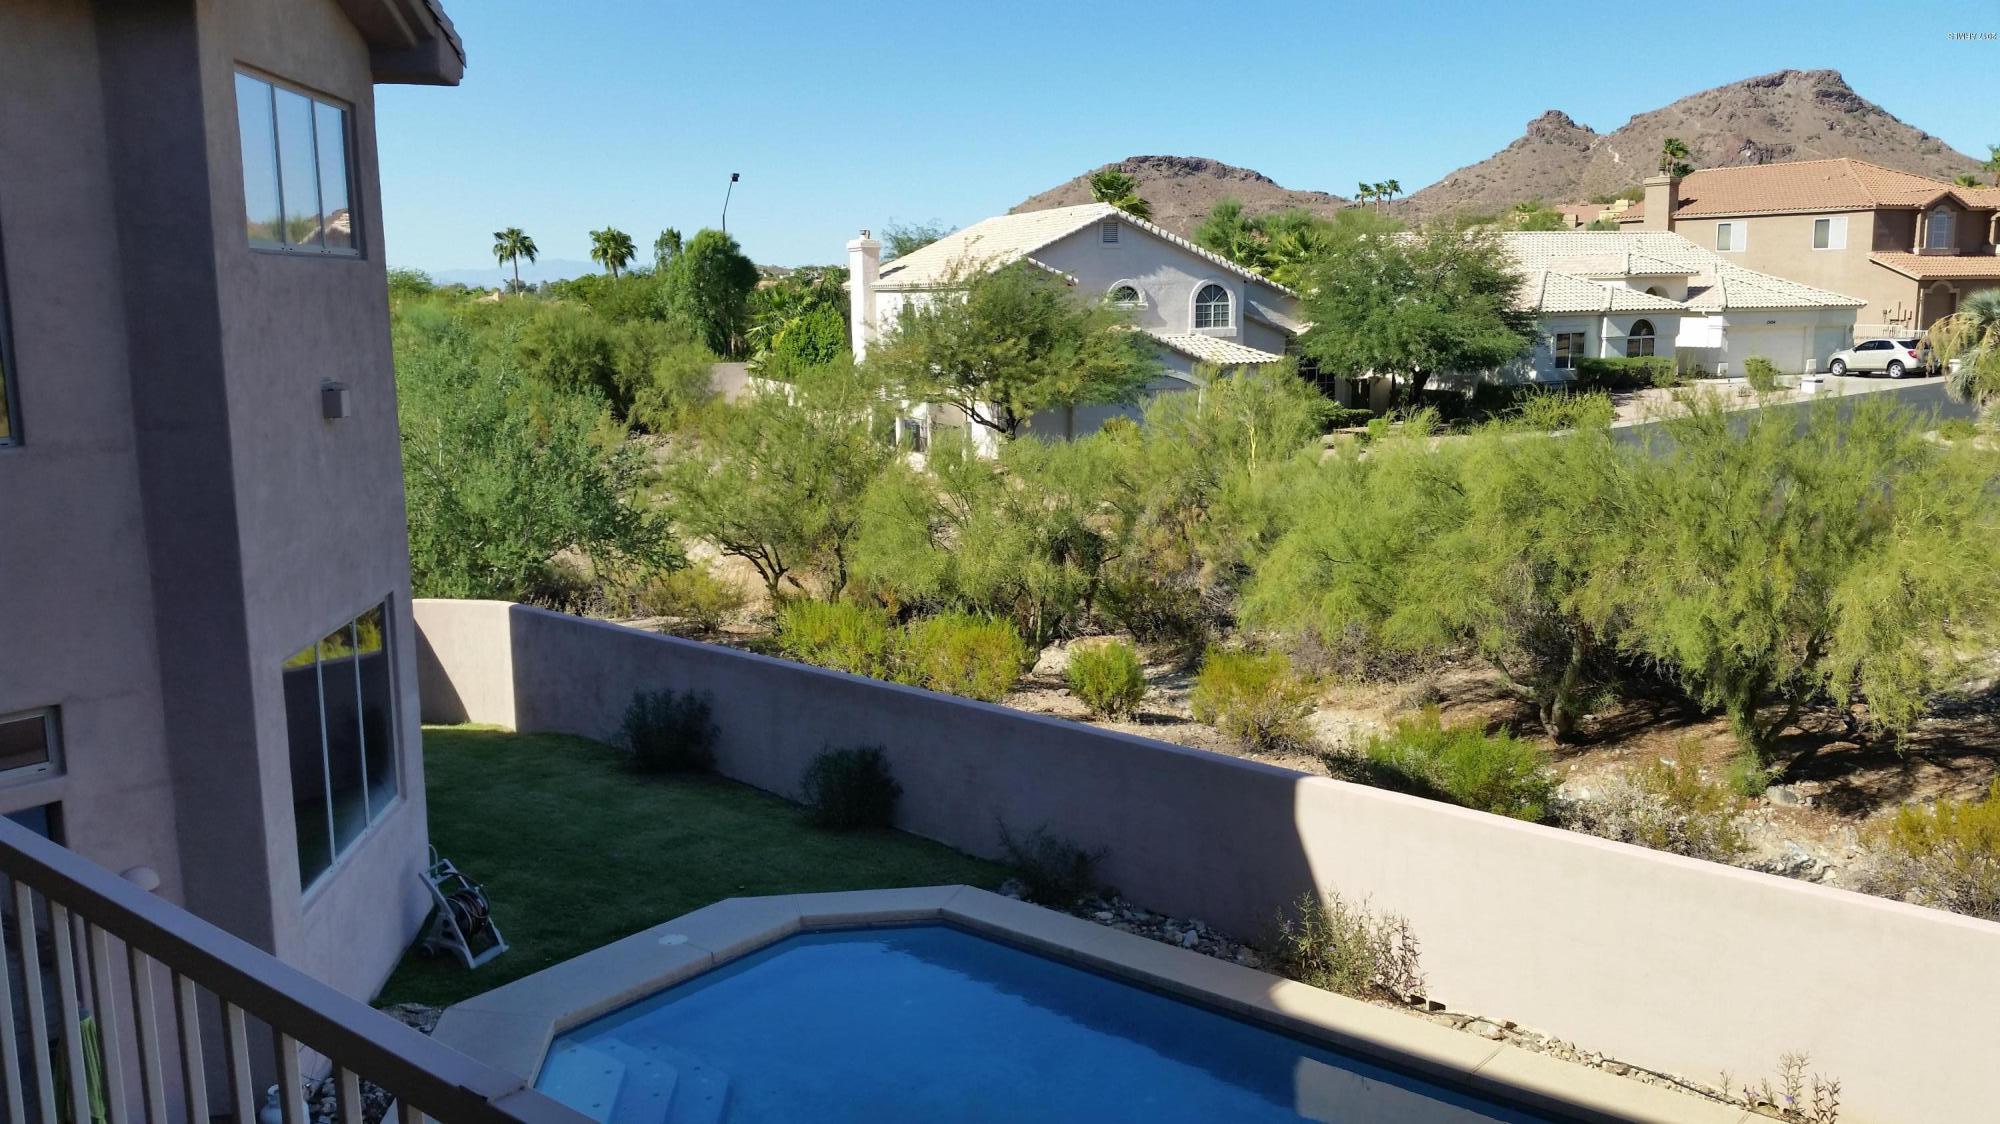 MLS 5656776 1314 E VICTOR HUGO Avenue, Phoenix, AZ 85022 Phoenix AZ Pointe Mountainside